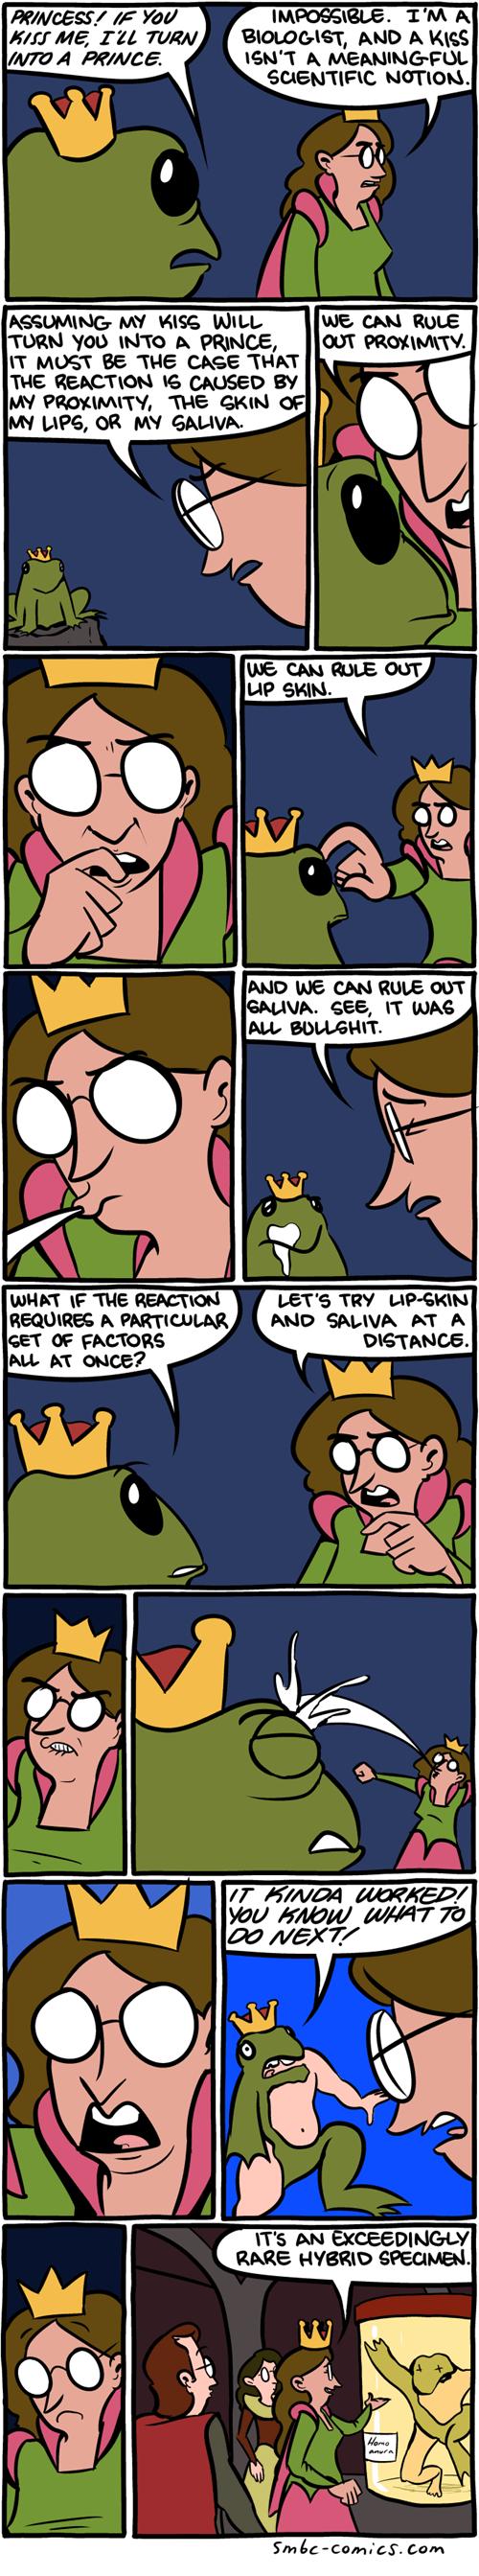 fairy tales frogs science web comics - 8184037376